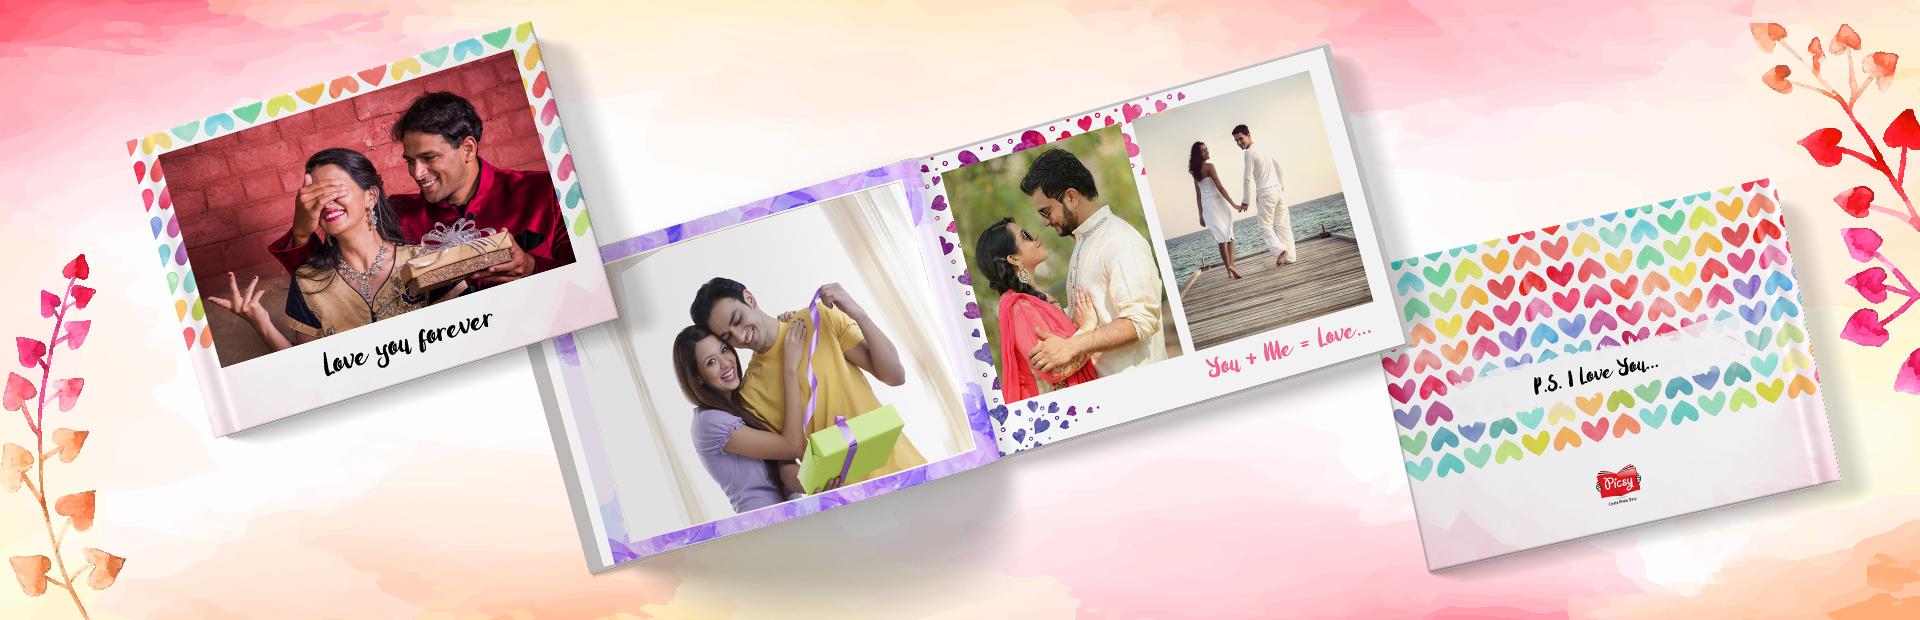 Love story Photo Books Online